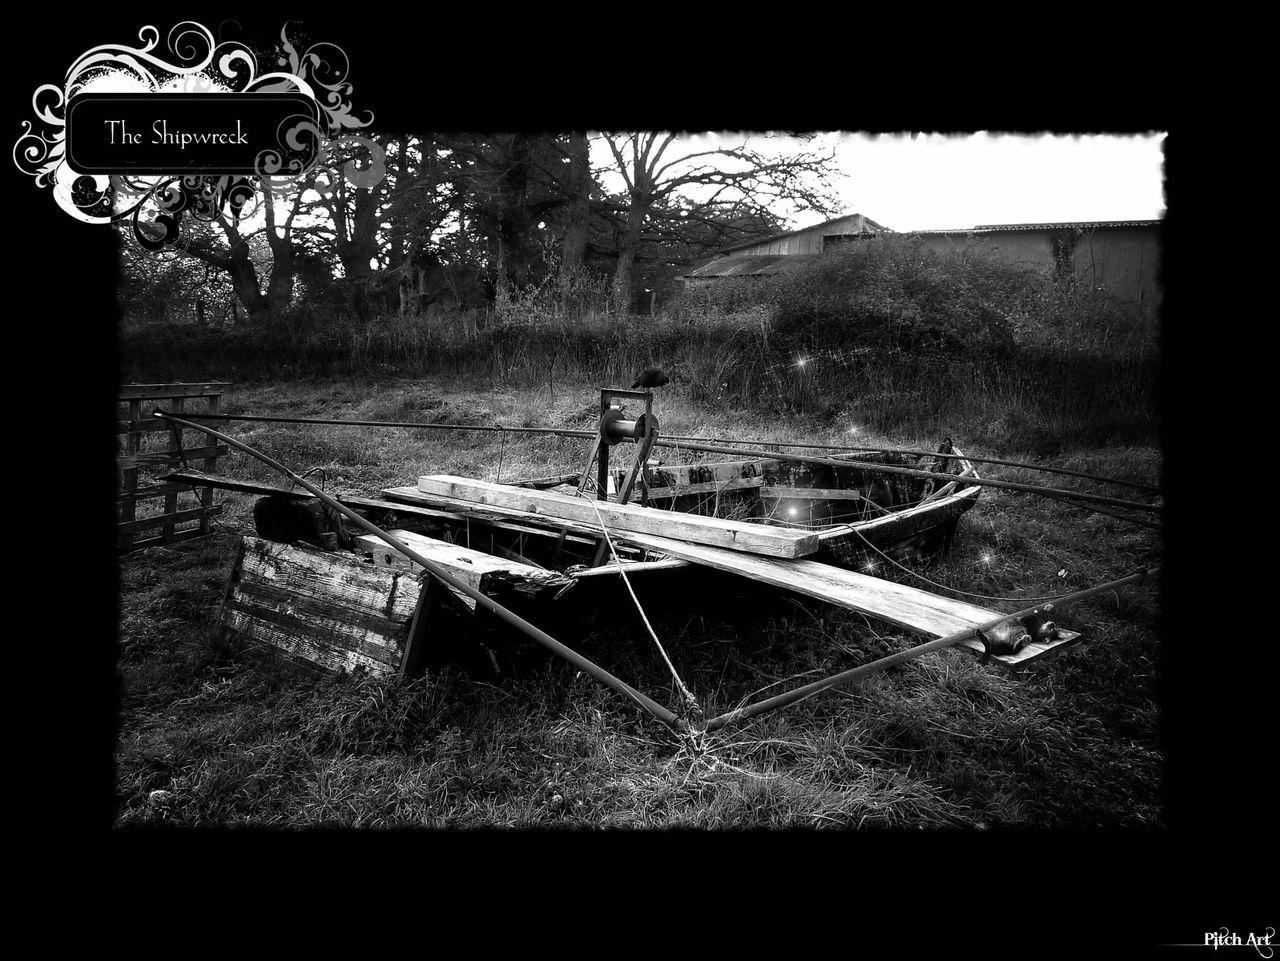 Studio Pitch Art The Shipwreck